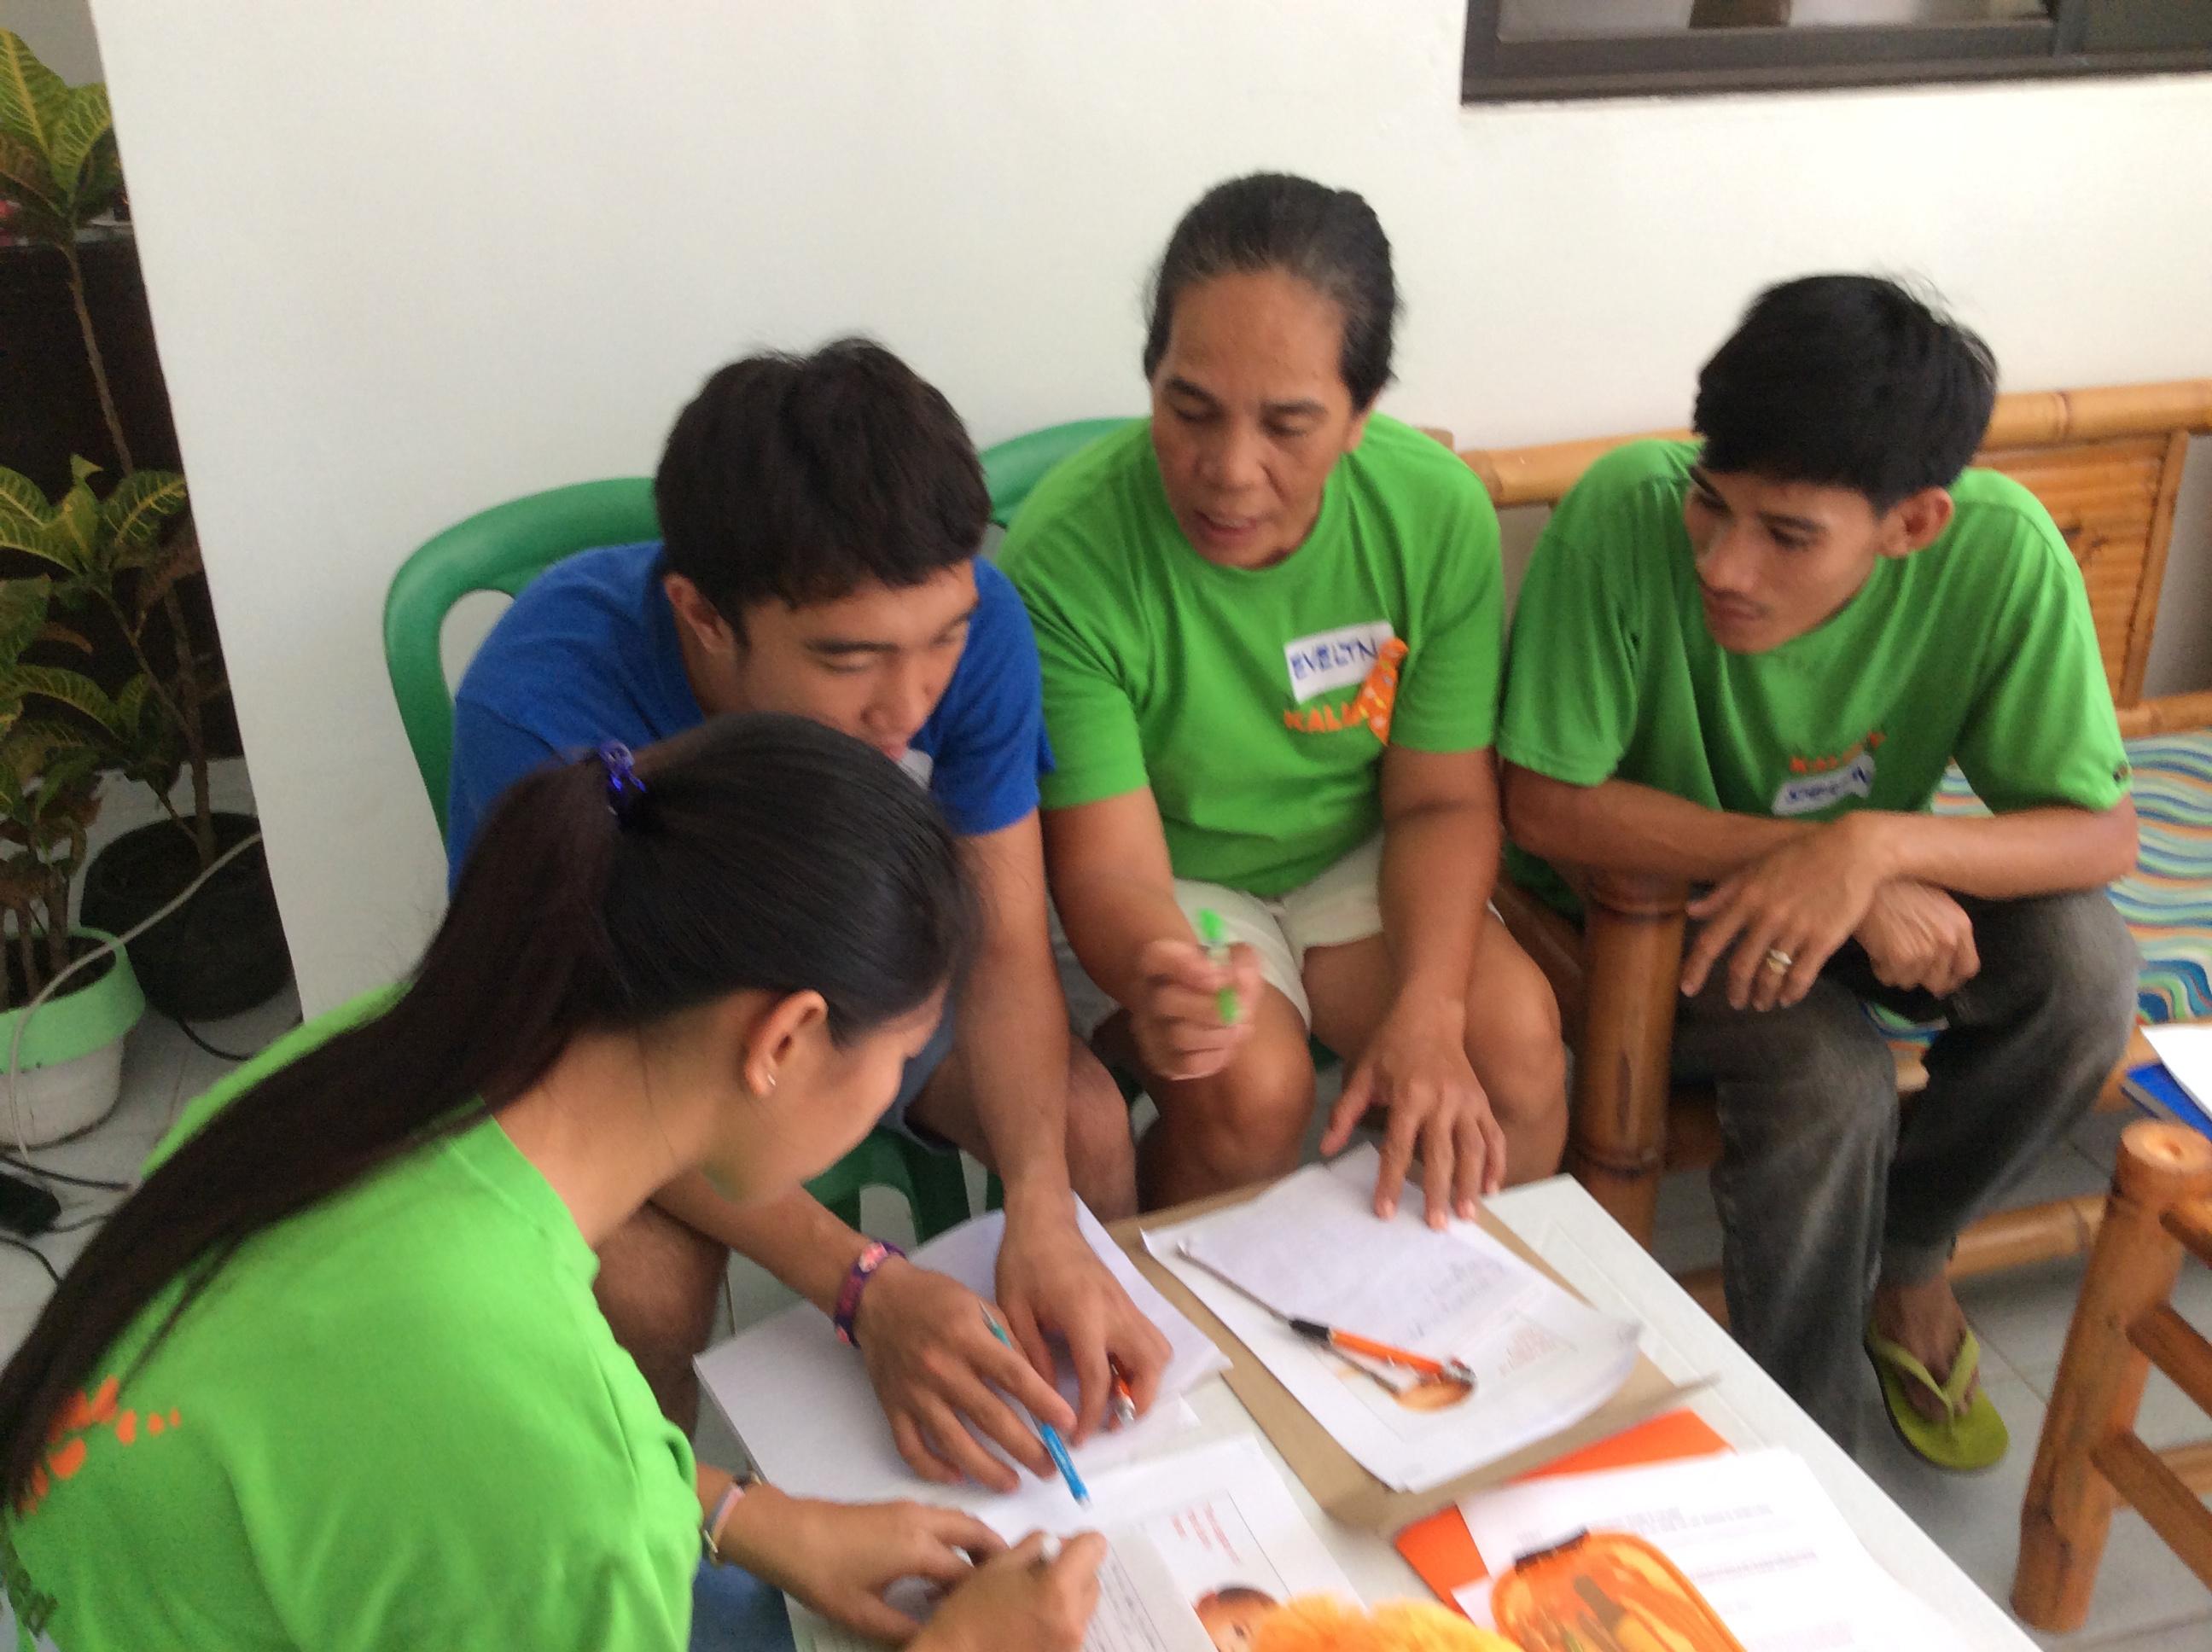 Training group